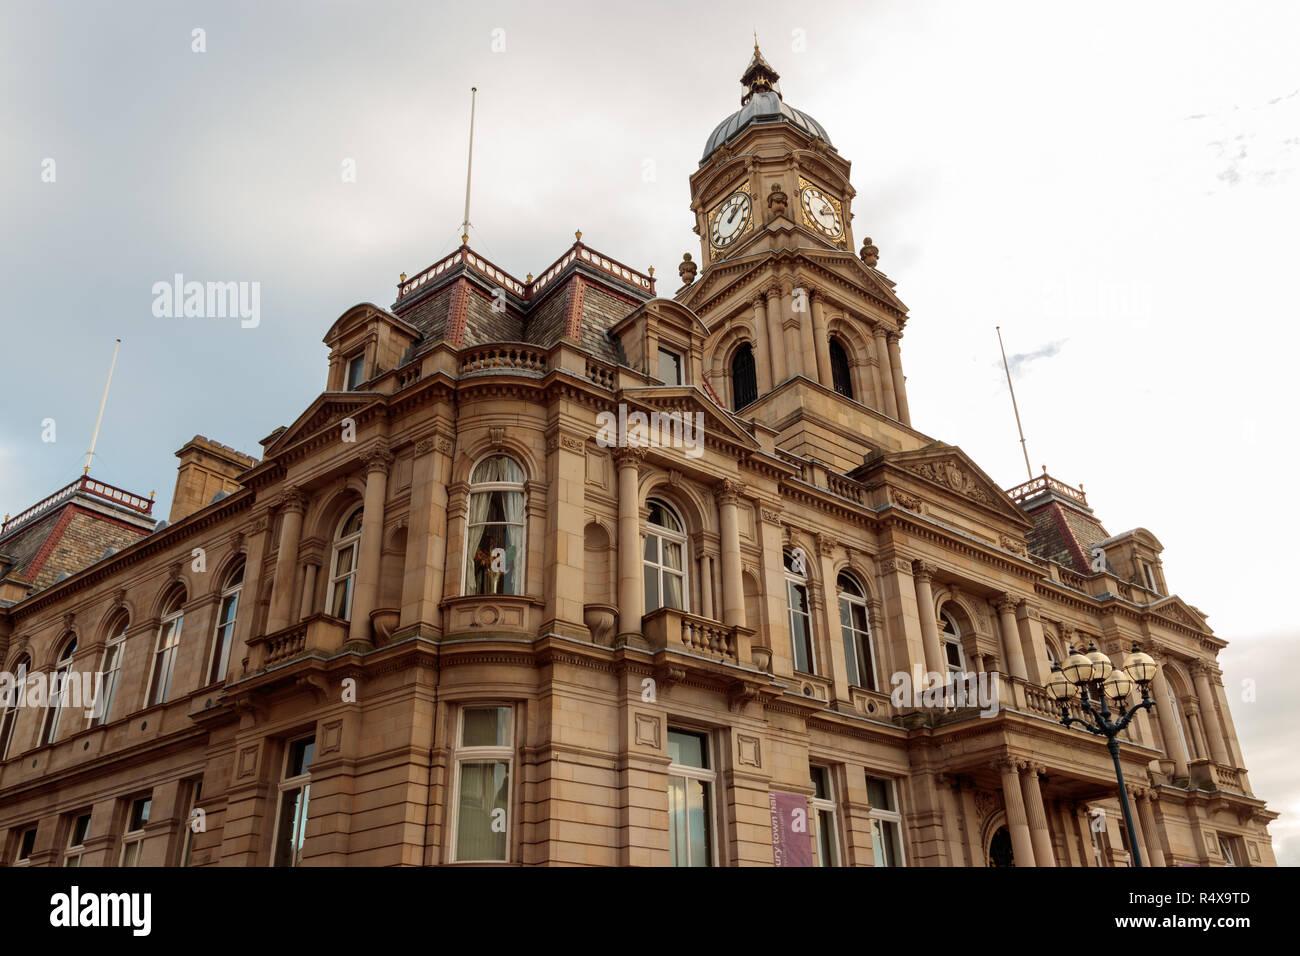 View of Dewsbury Town Hall - Stock Image